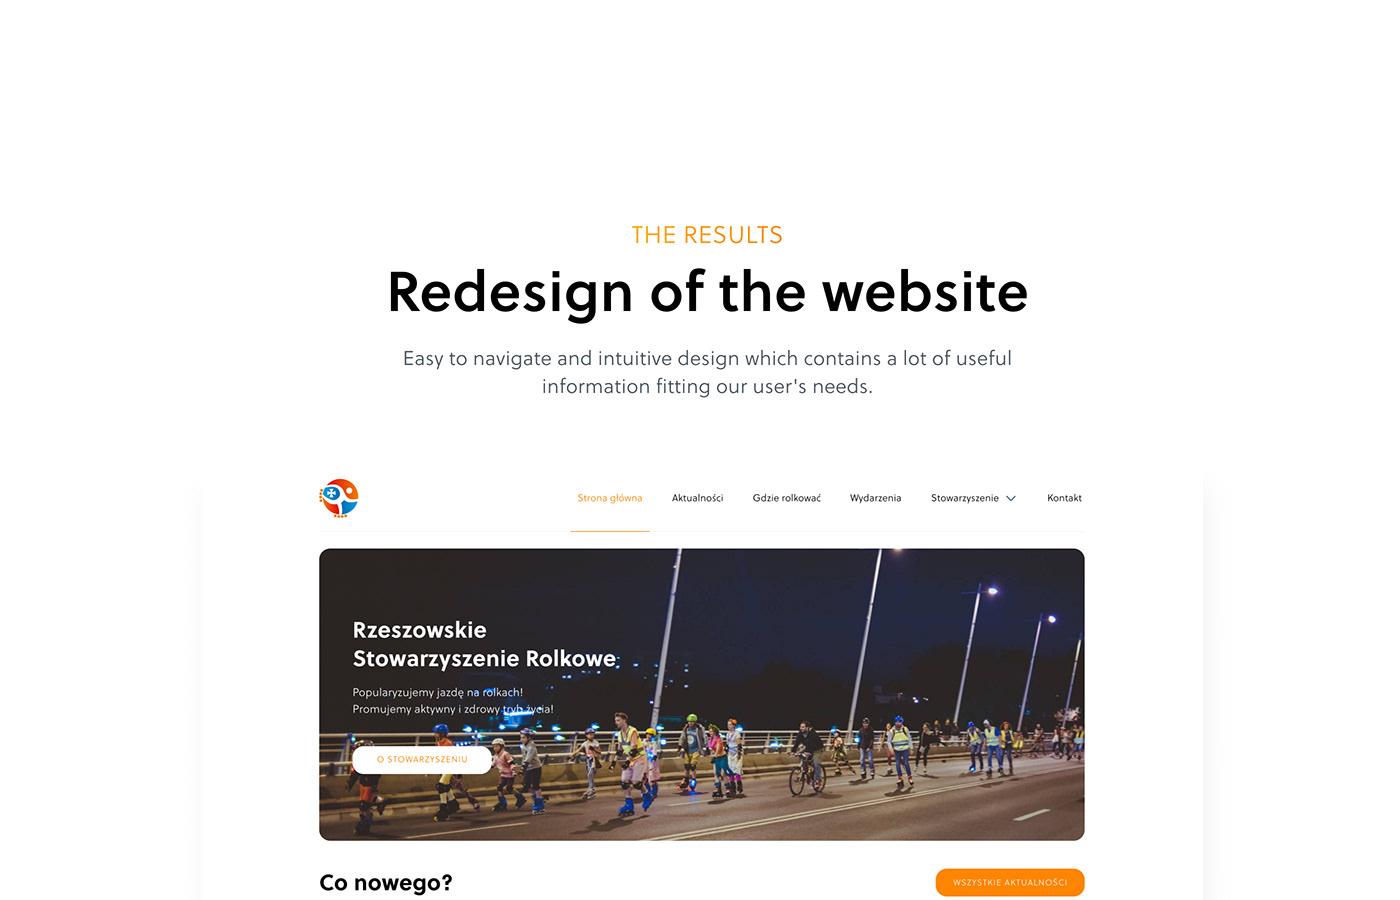 Association fitness healthy lifestyle news skate Skating sport ux/ui Web Design